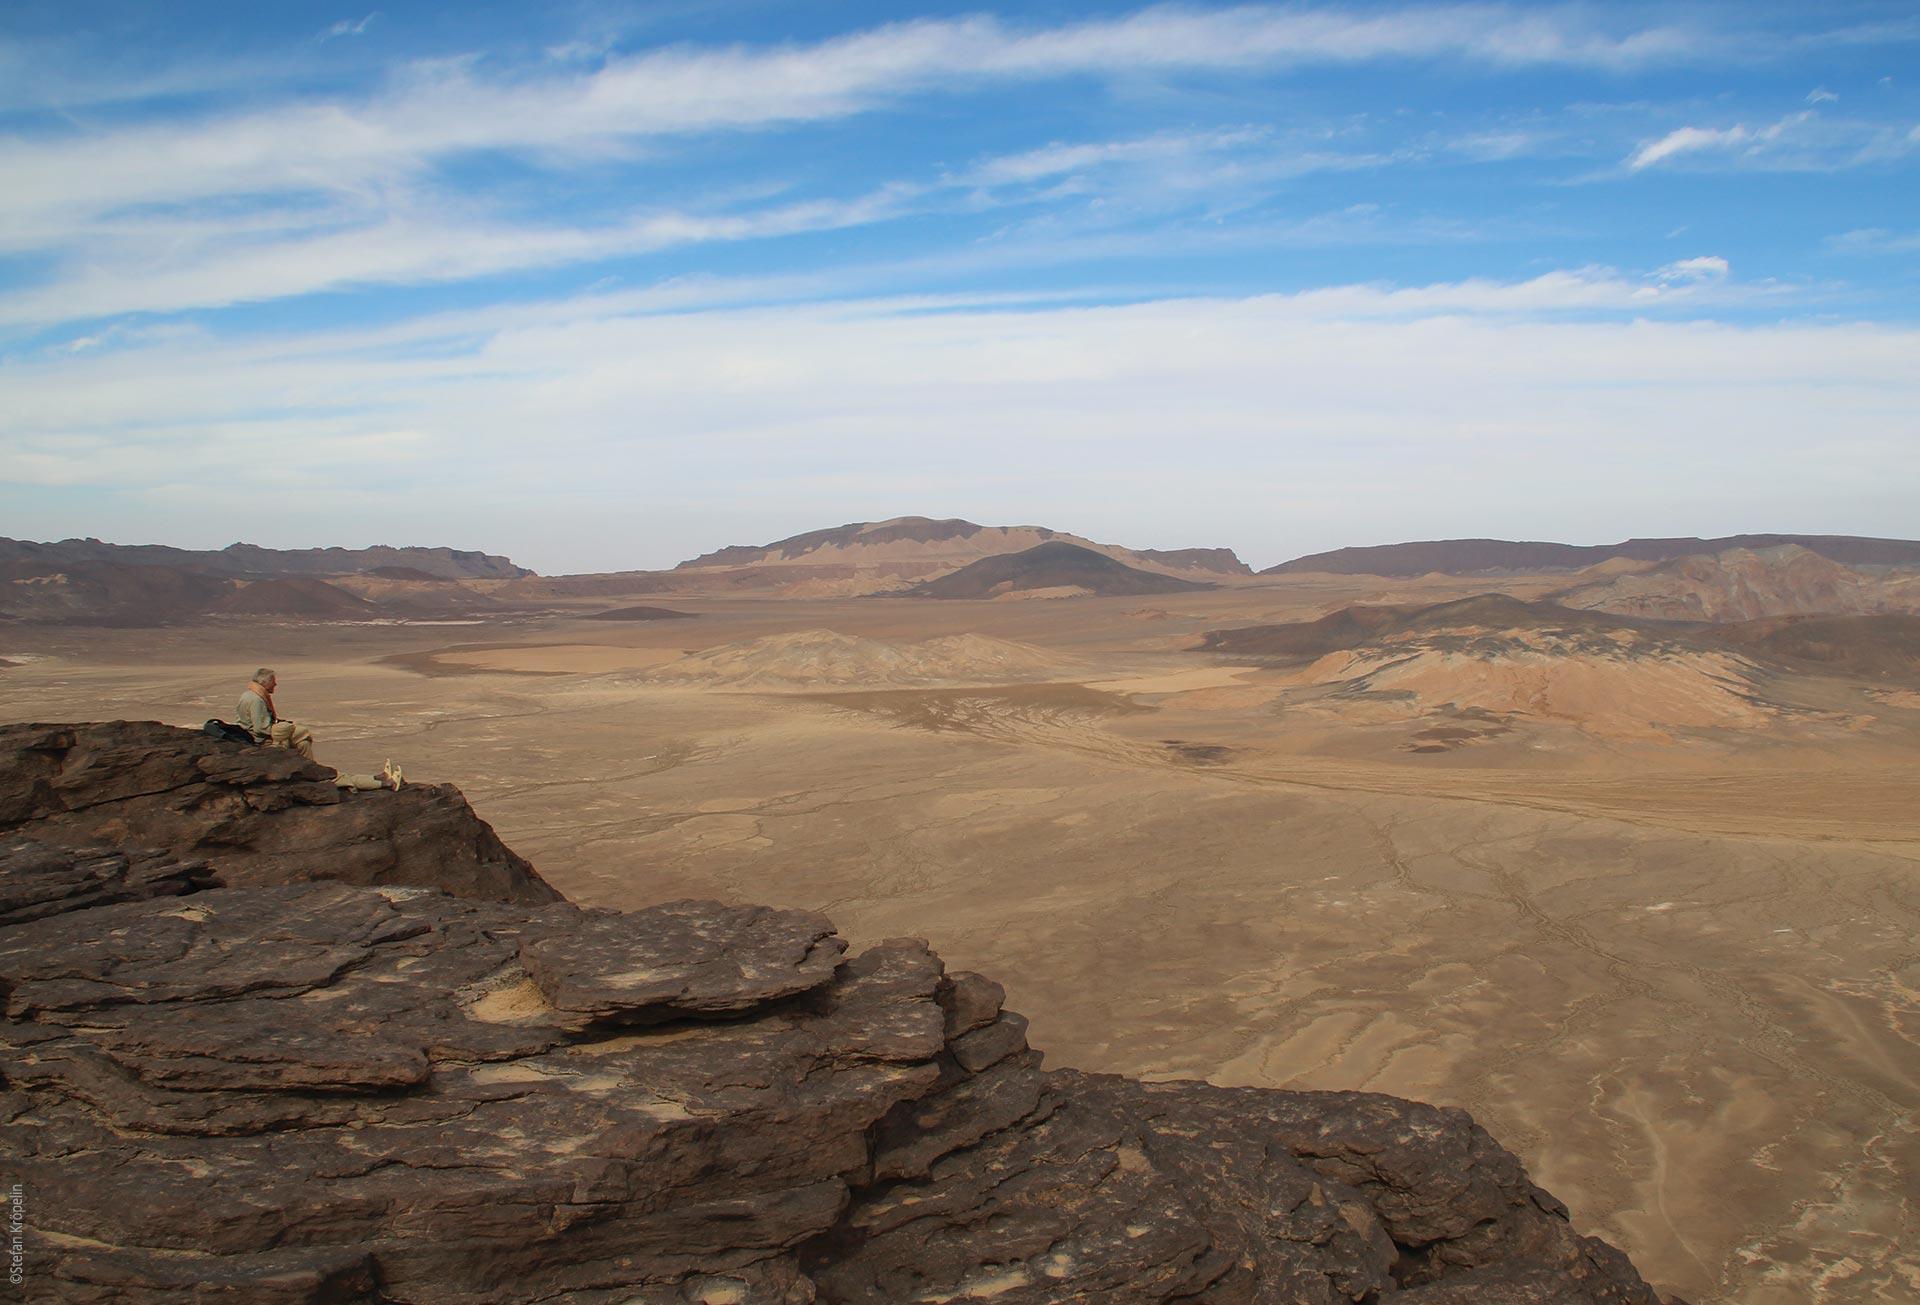 Das Tibesti Gebirge, Emi Koussi, Caldera, Stefan Kröpelin am Felsrand sitzend, Explore Chad